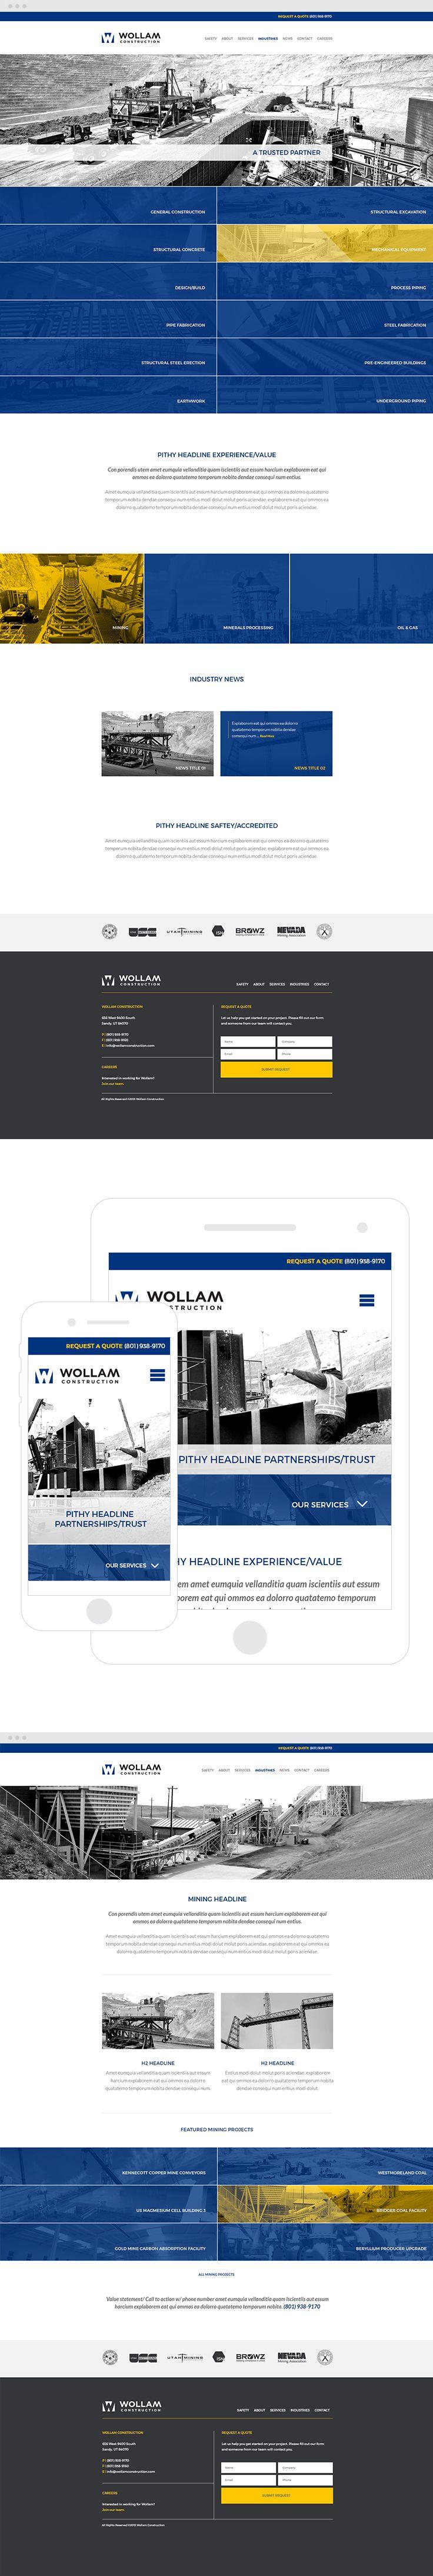 Wollam Construction